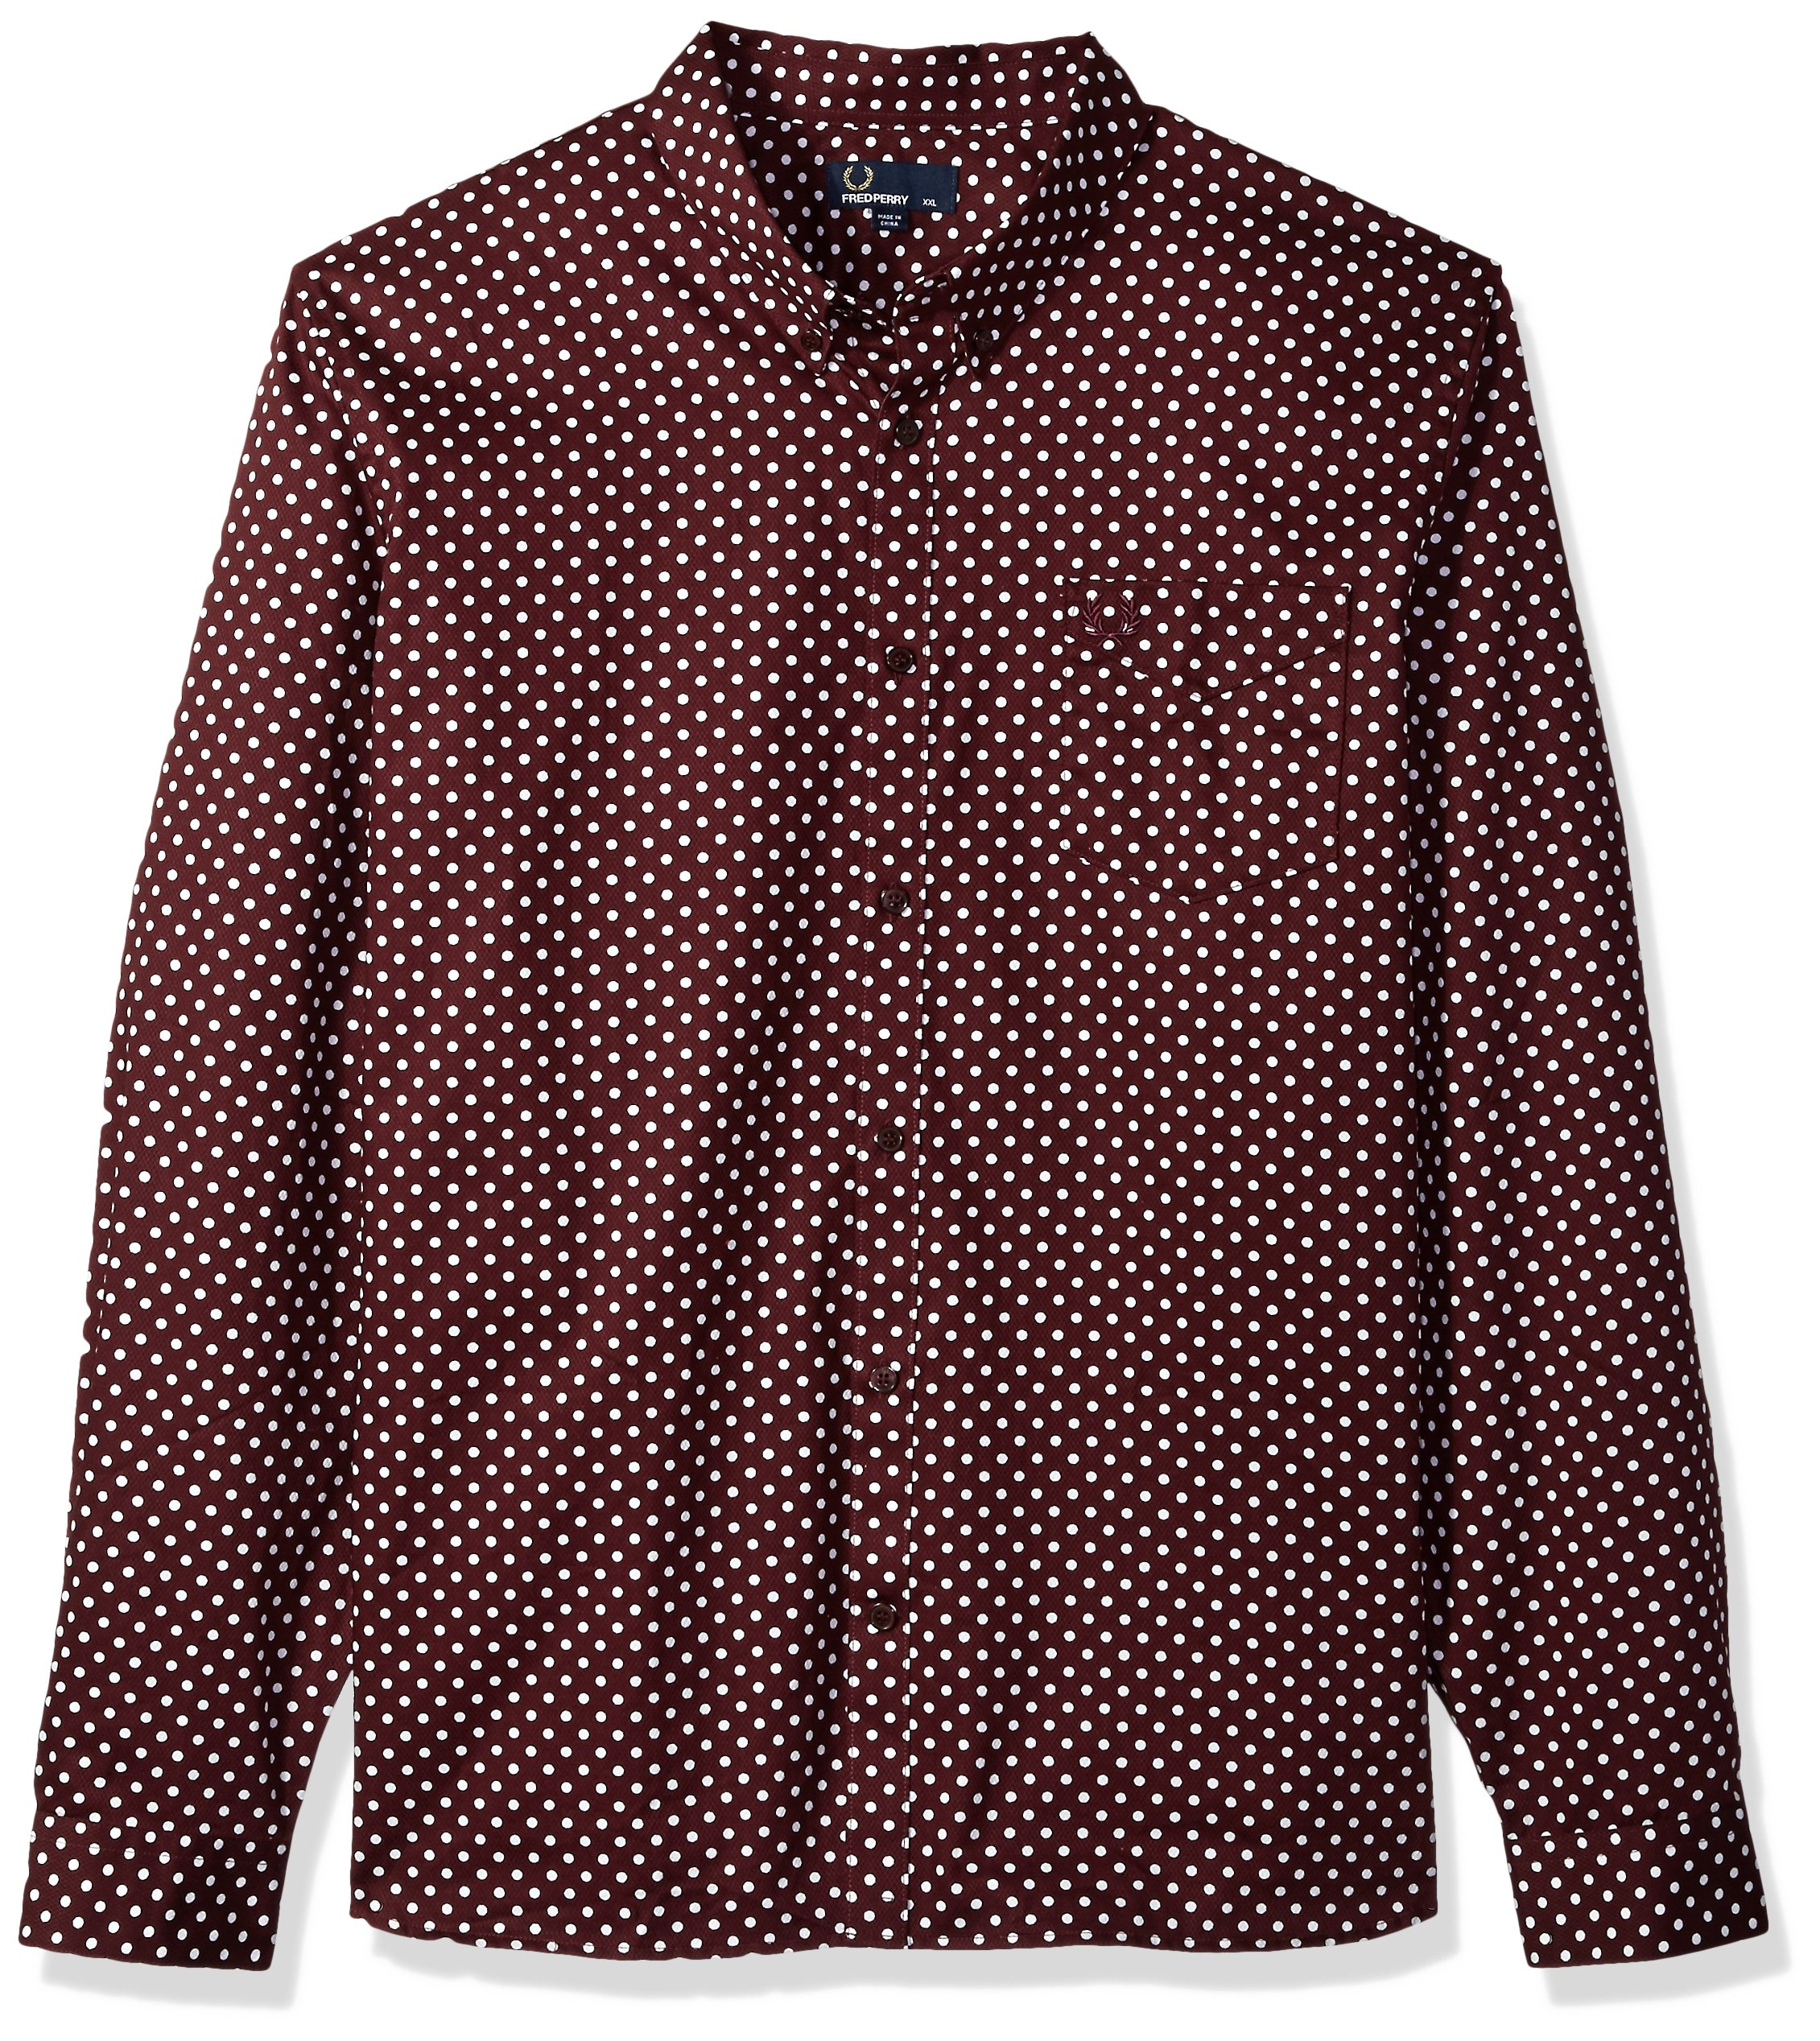 Fred Perry Men's Polka Dot Shirt, Mahogany, Medium